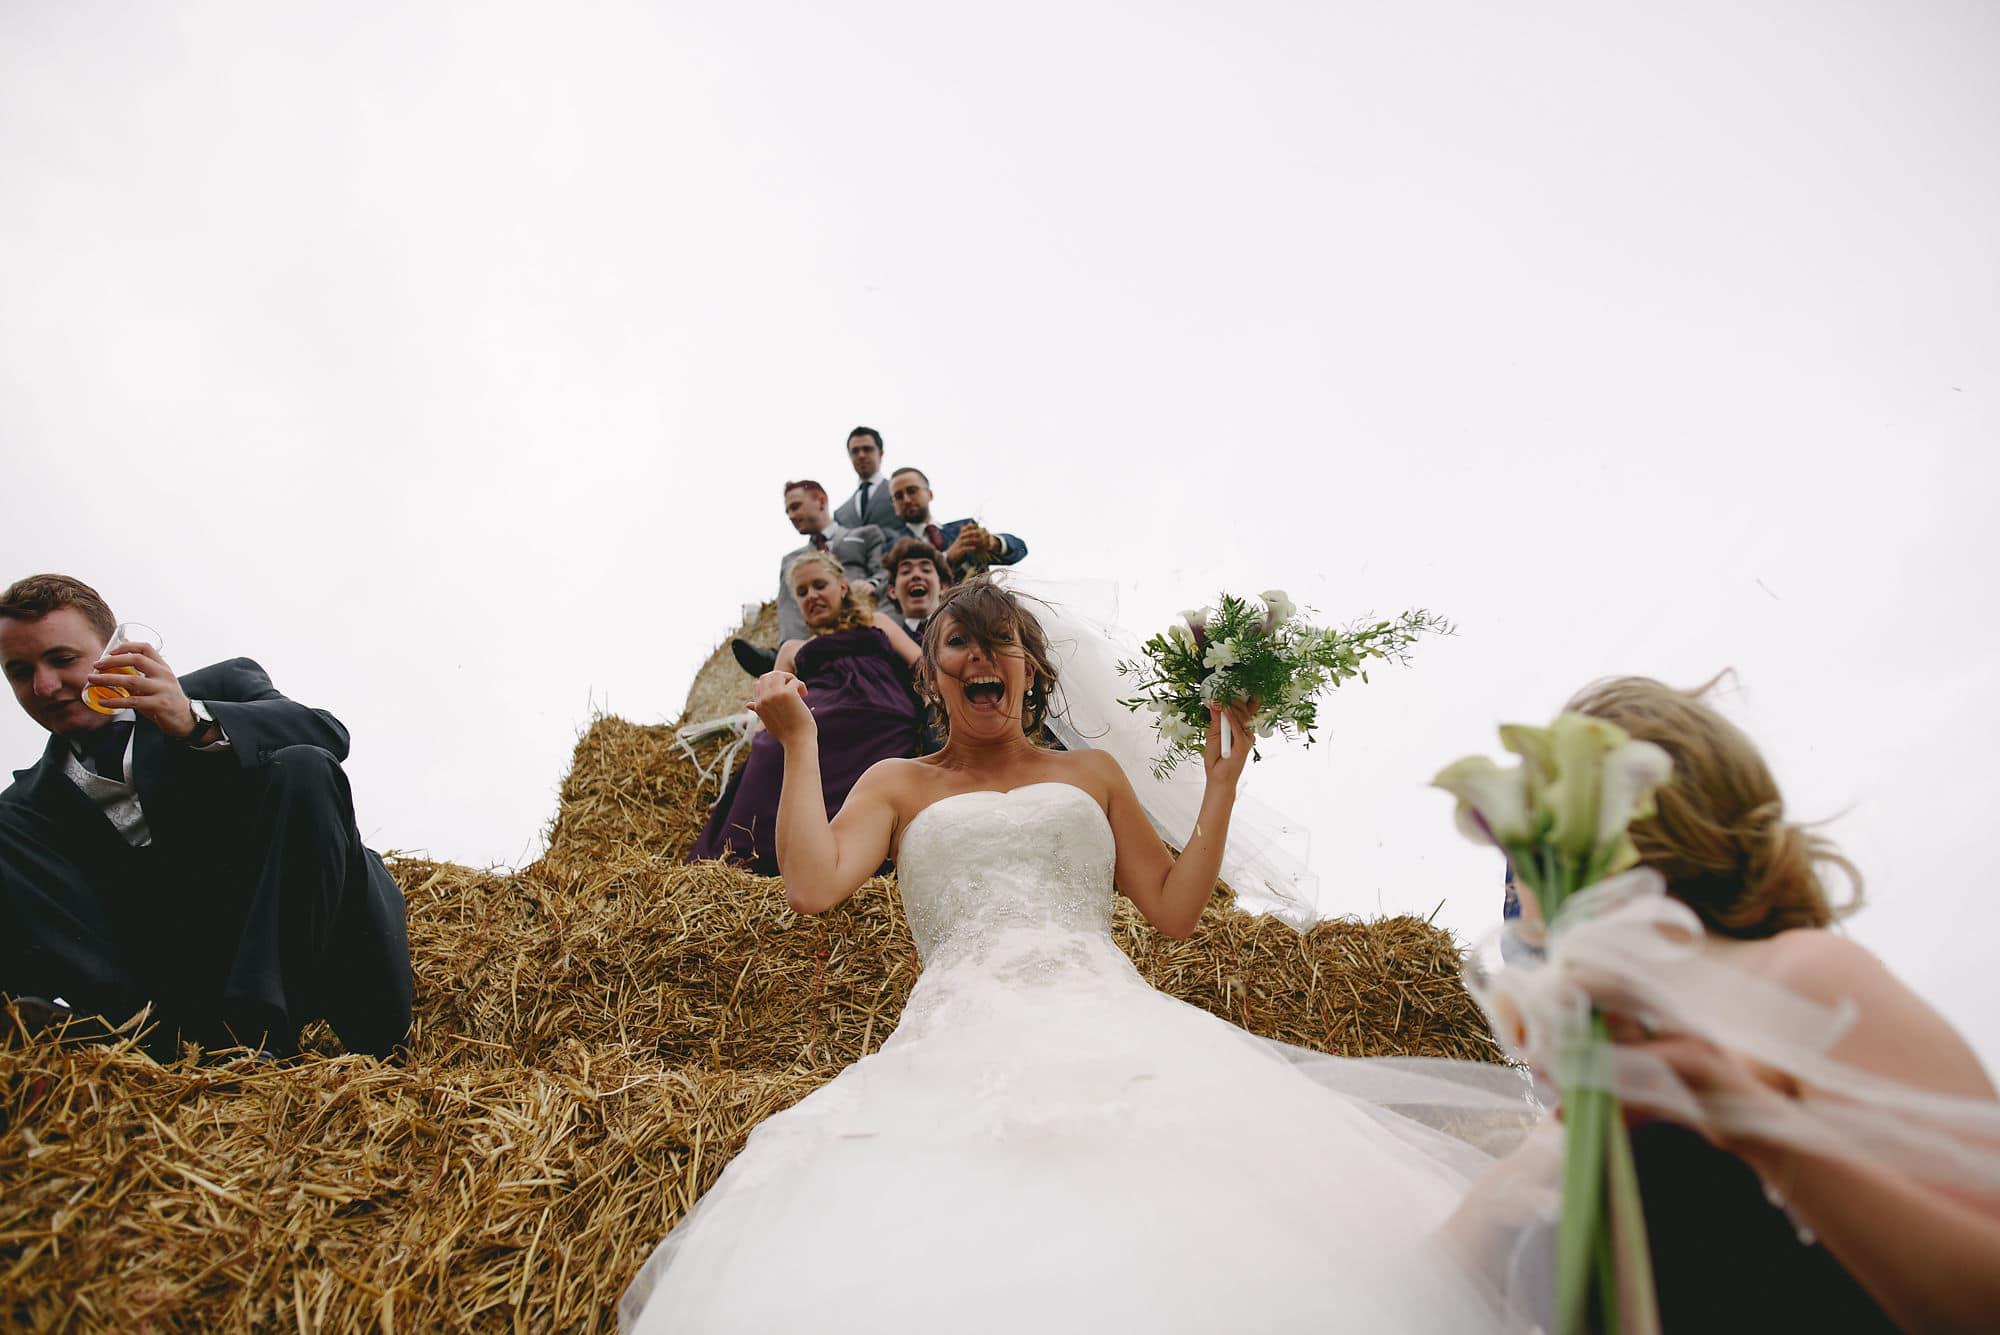 Matt & Holly's Beccles Wedding 12